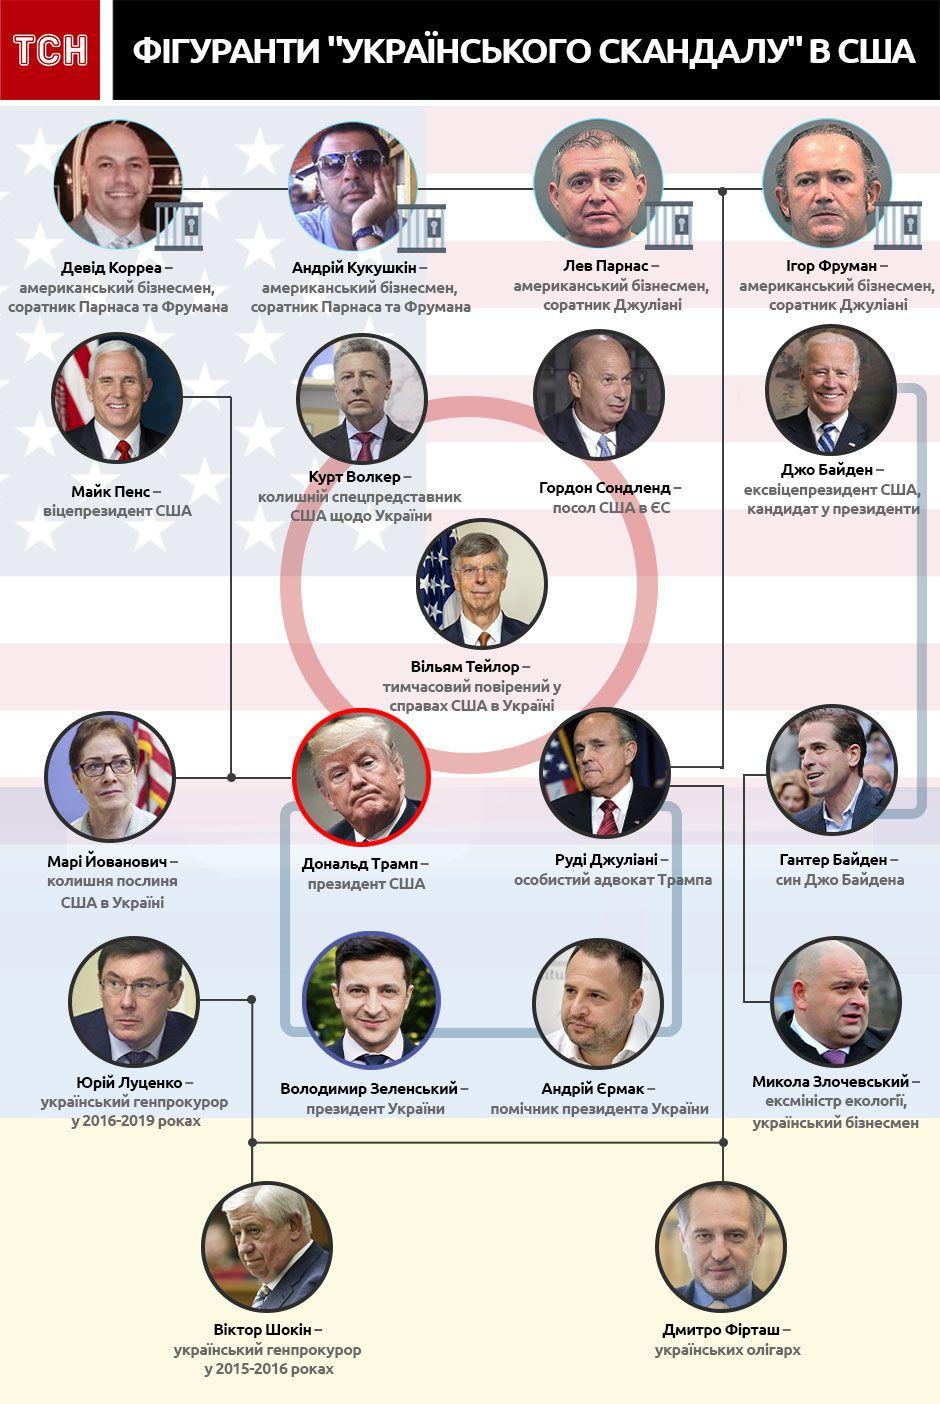 скандал із дзвінком Трампа і Зеленського, інфографіка